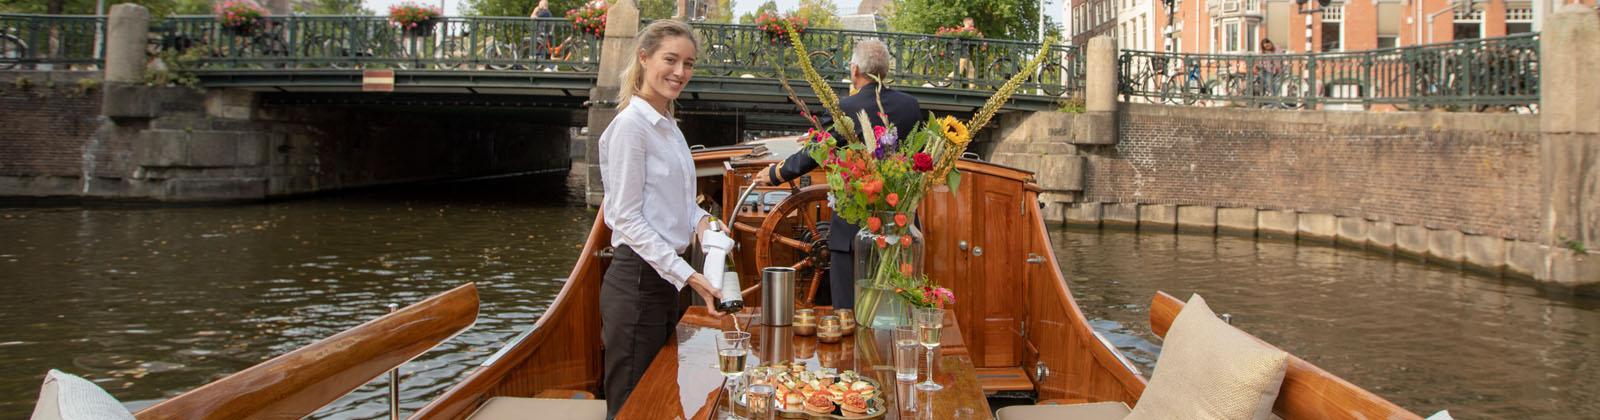 Luxury-travel-Amsterdam